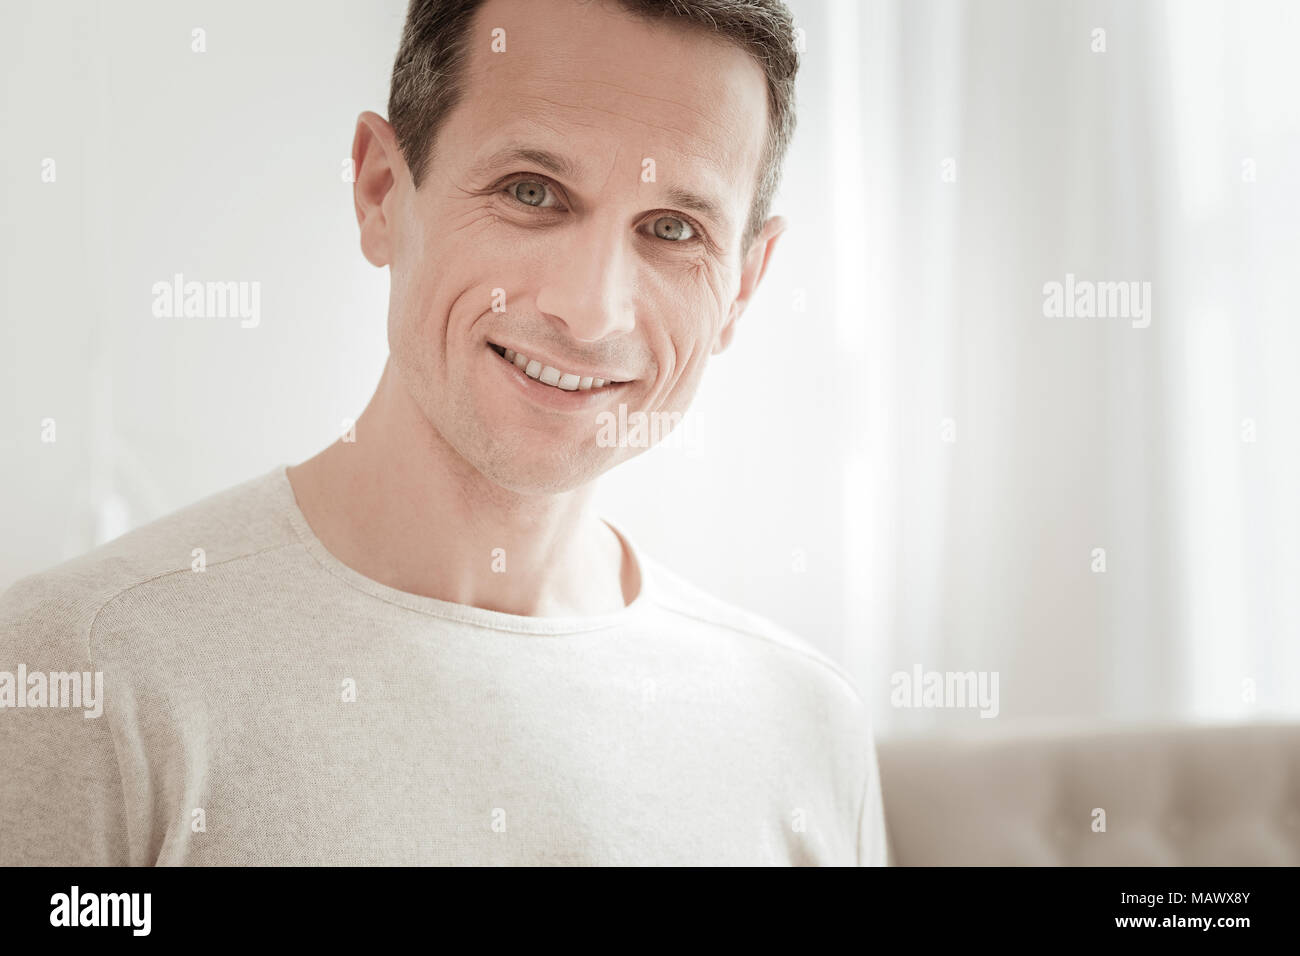 Joyful happy man looking straight and smiling. Stock Photo